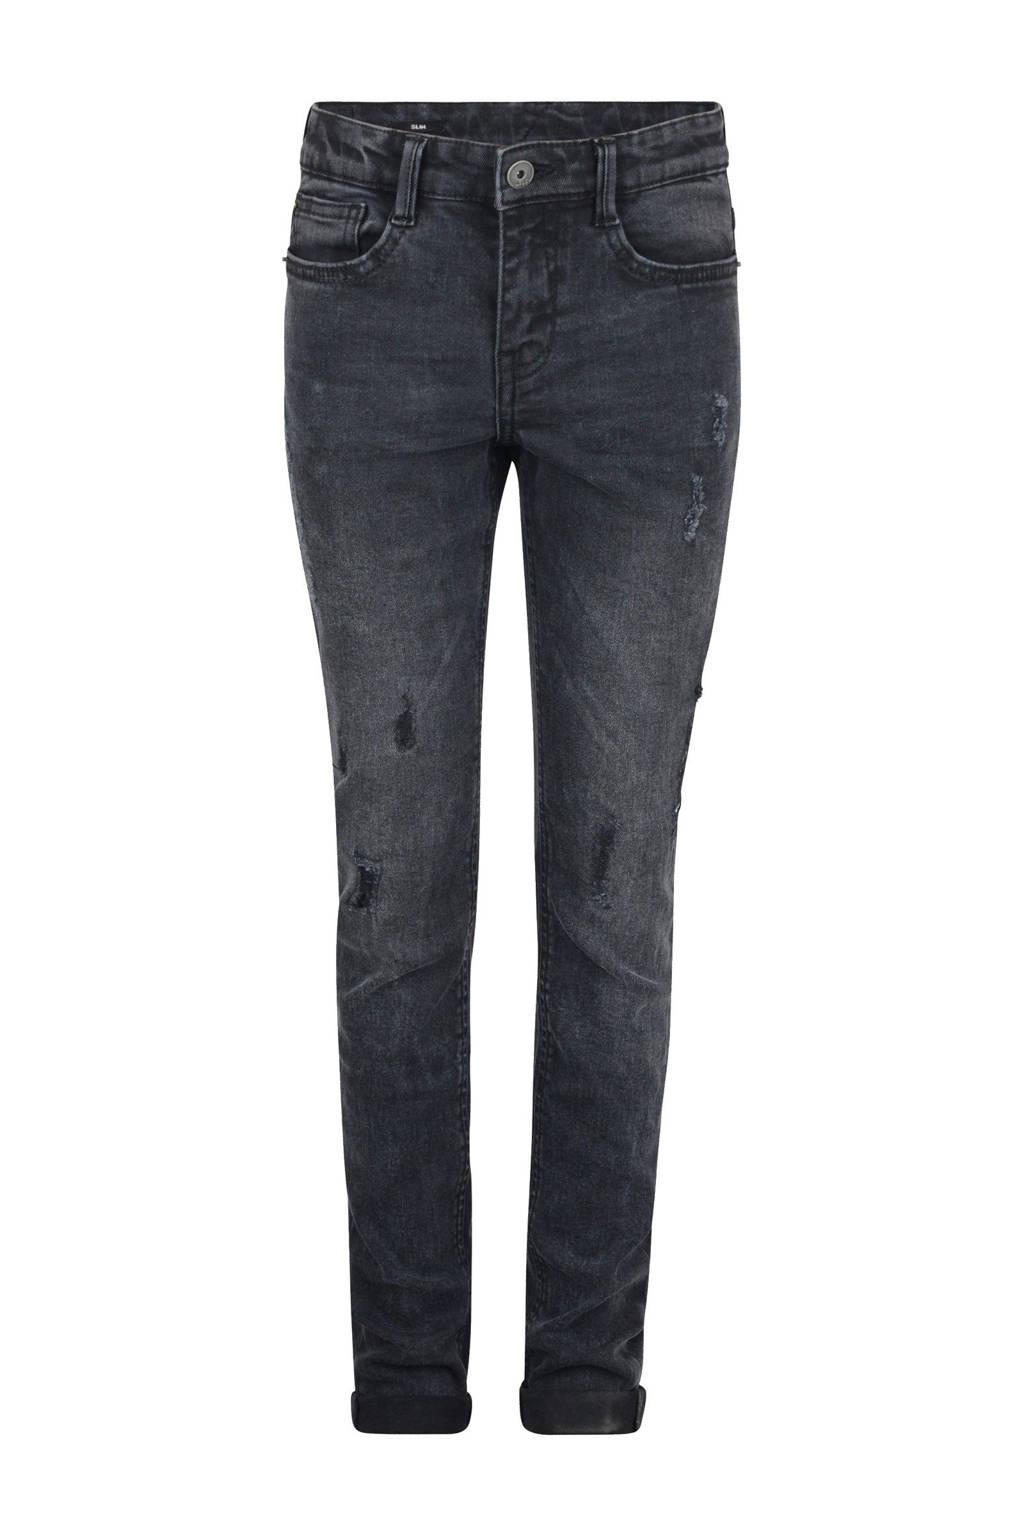 Shoeby Jill & Mitch slim fit jeans black denim, Black denim